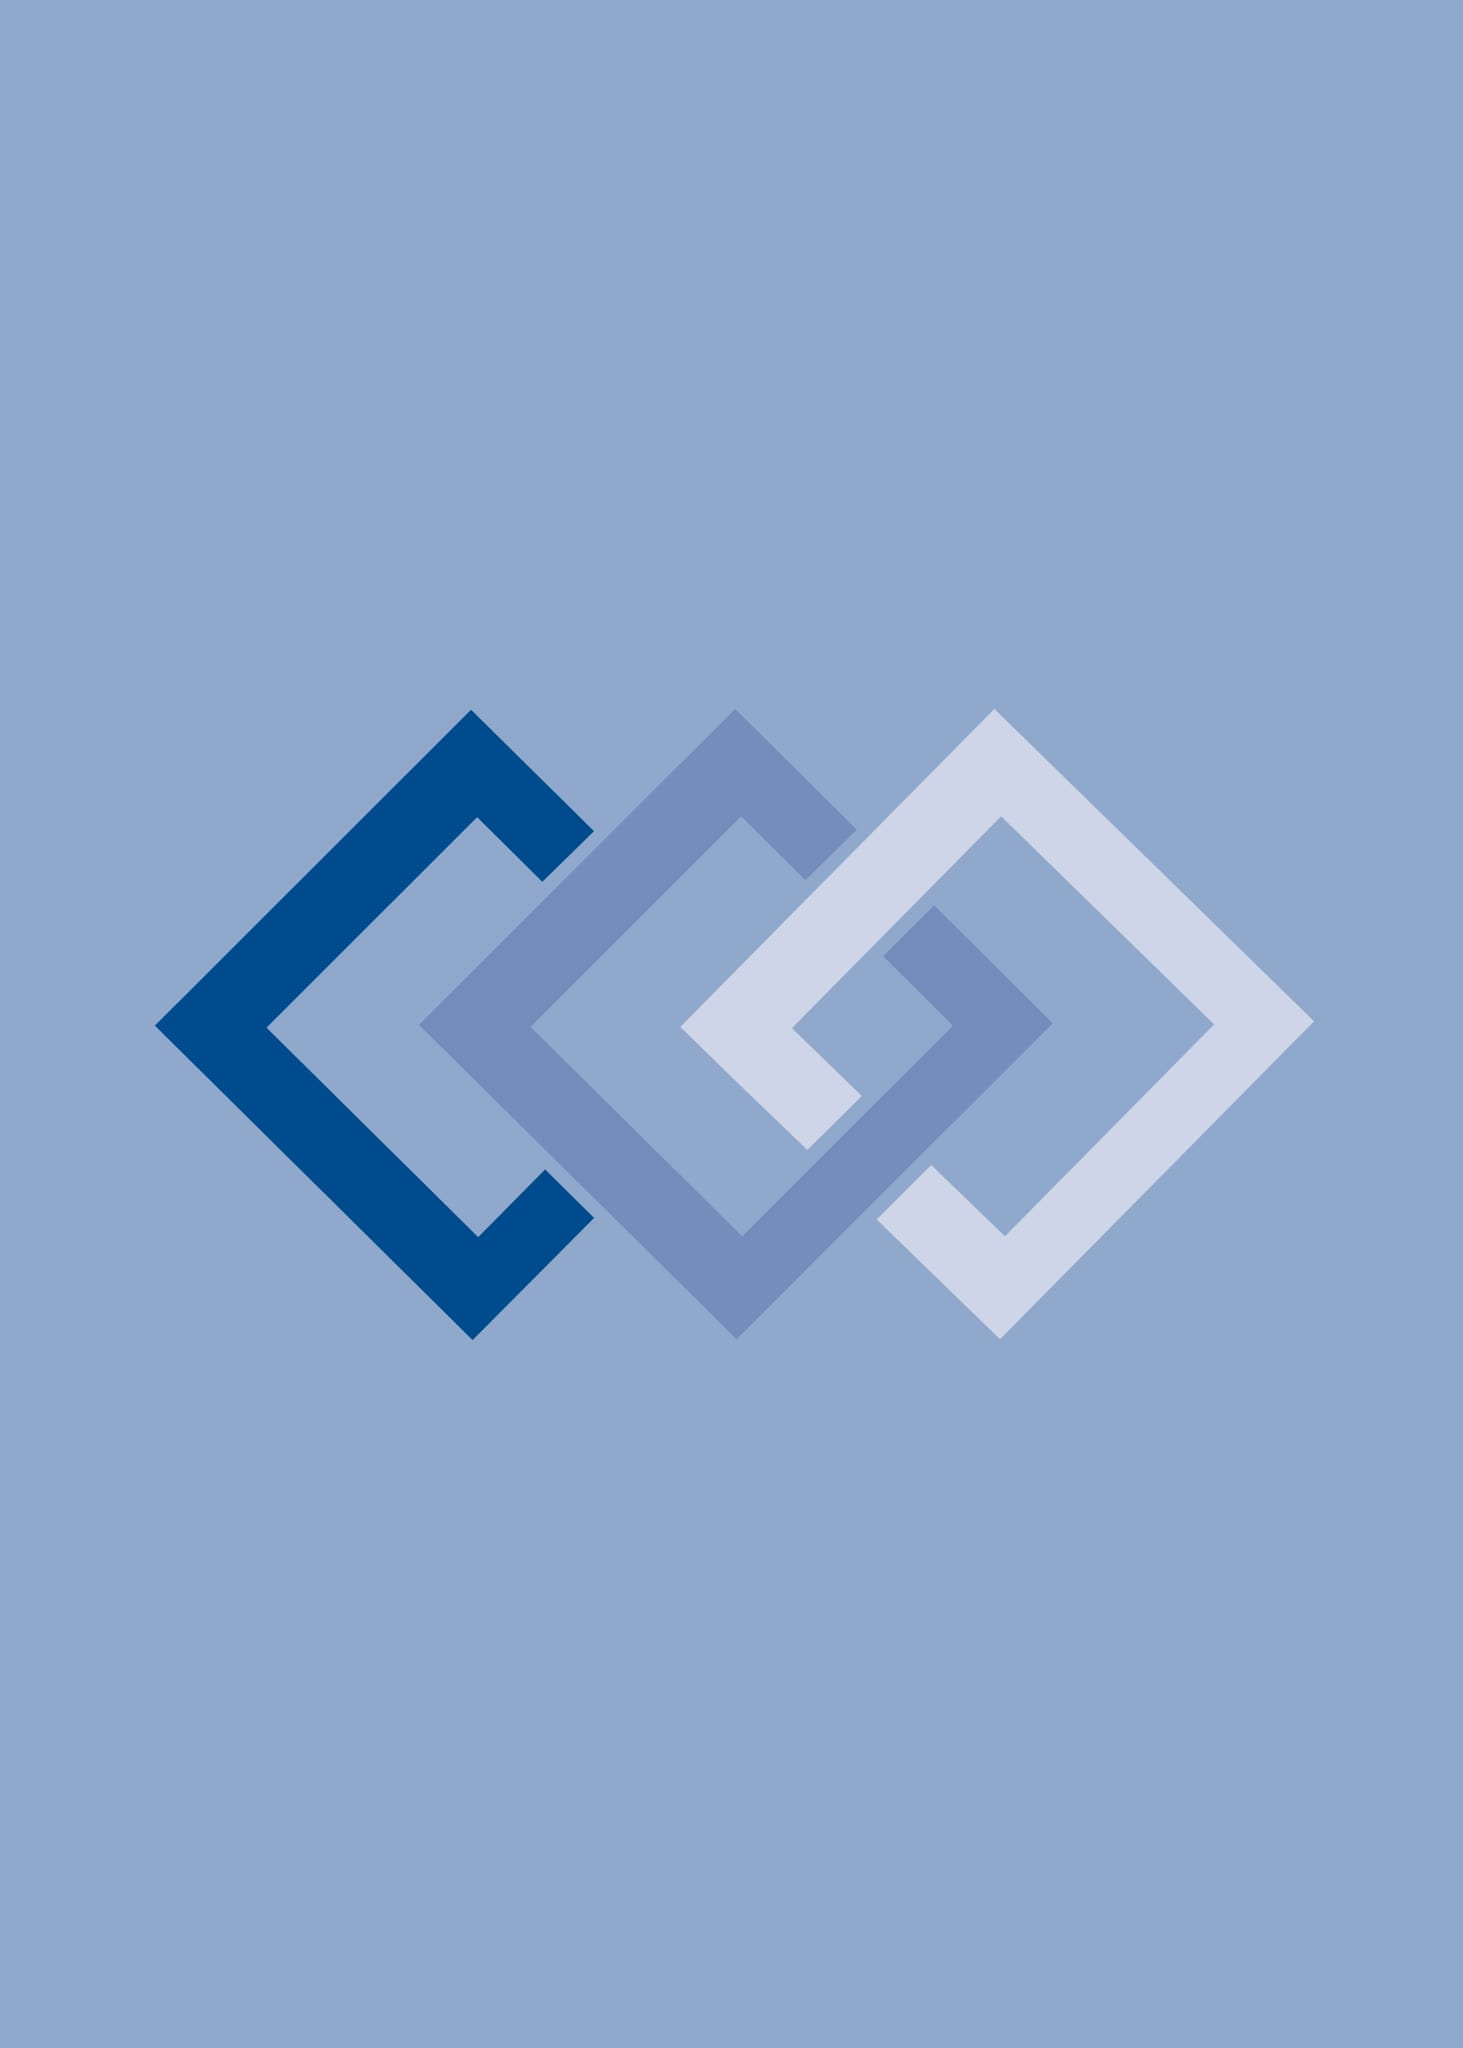 burkhart-logo-placeholder